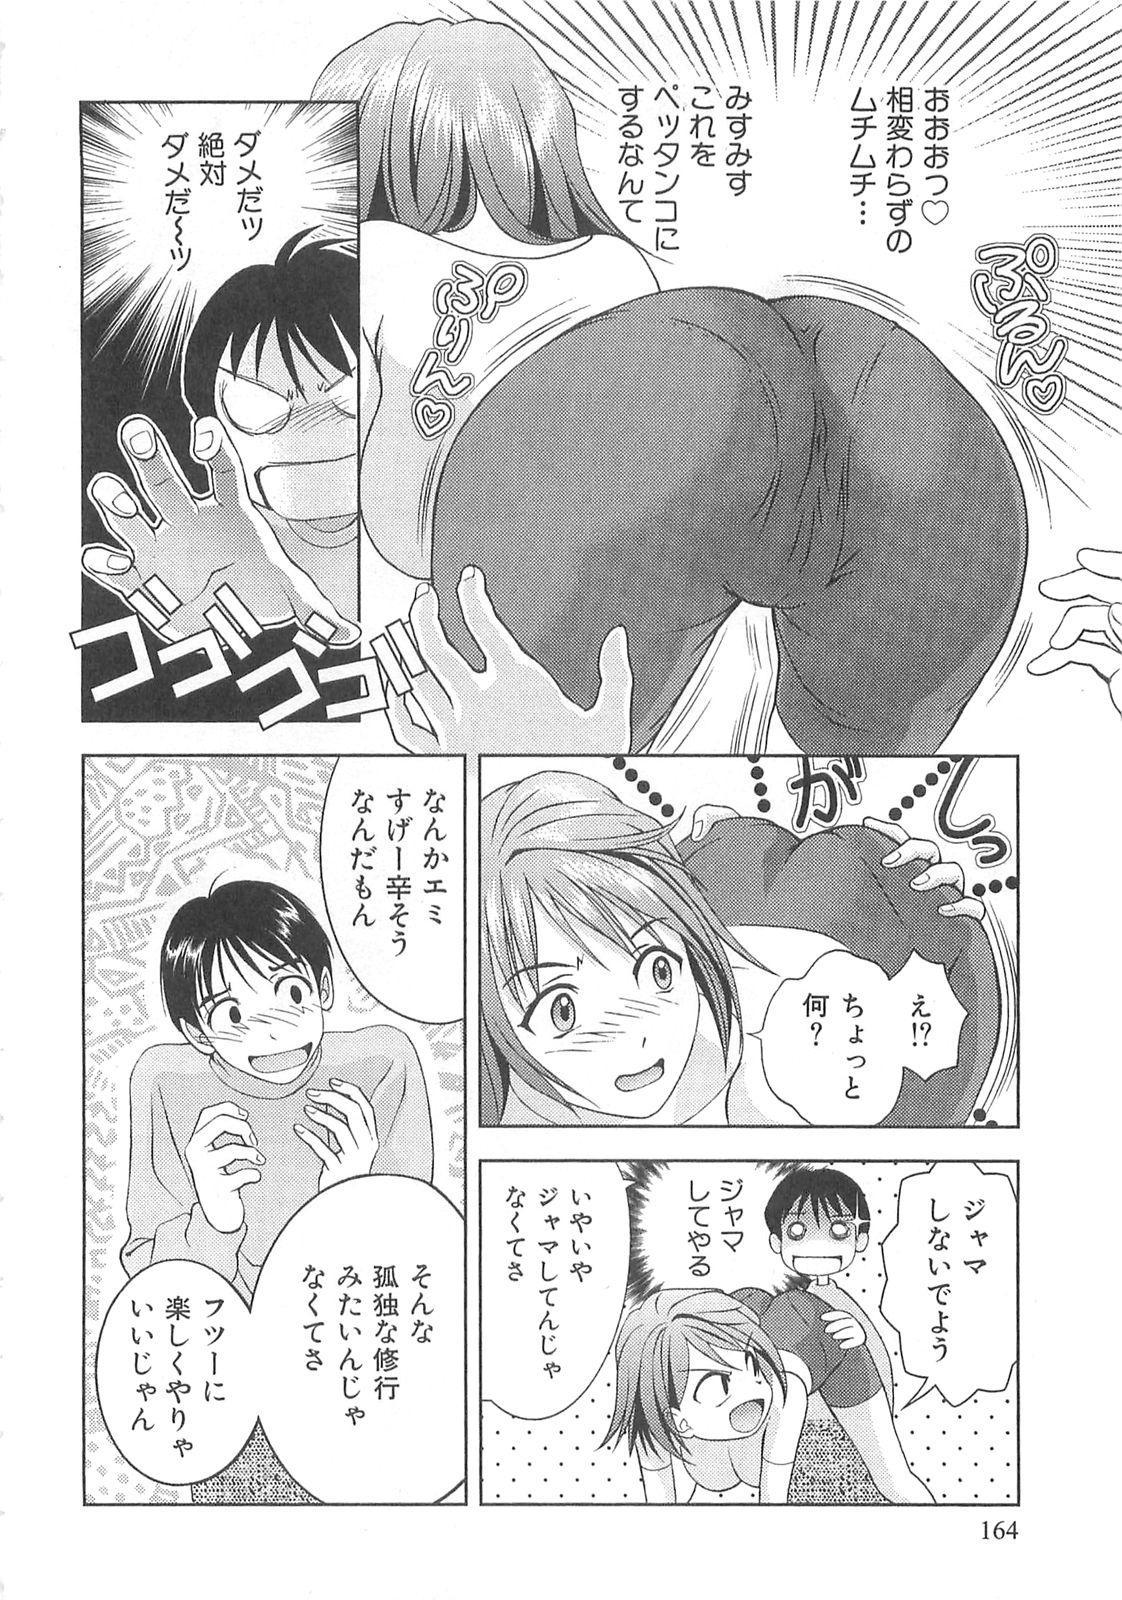 Tenshi no Kyuu - Angel's Pretty Hip 164